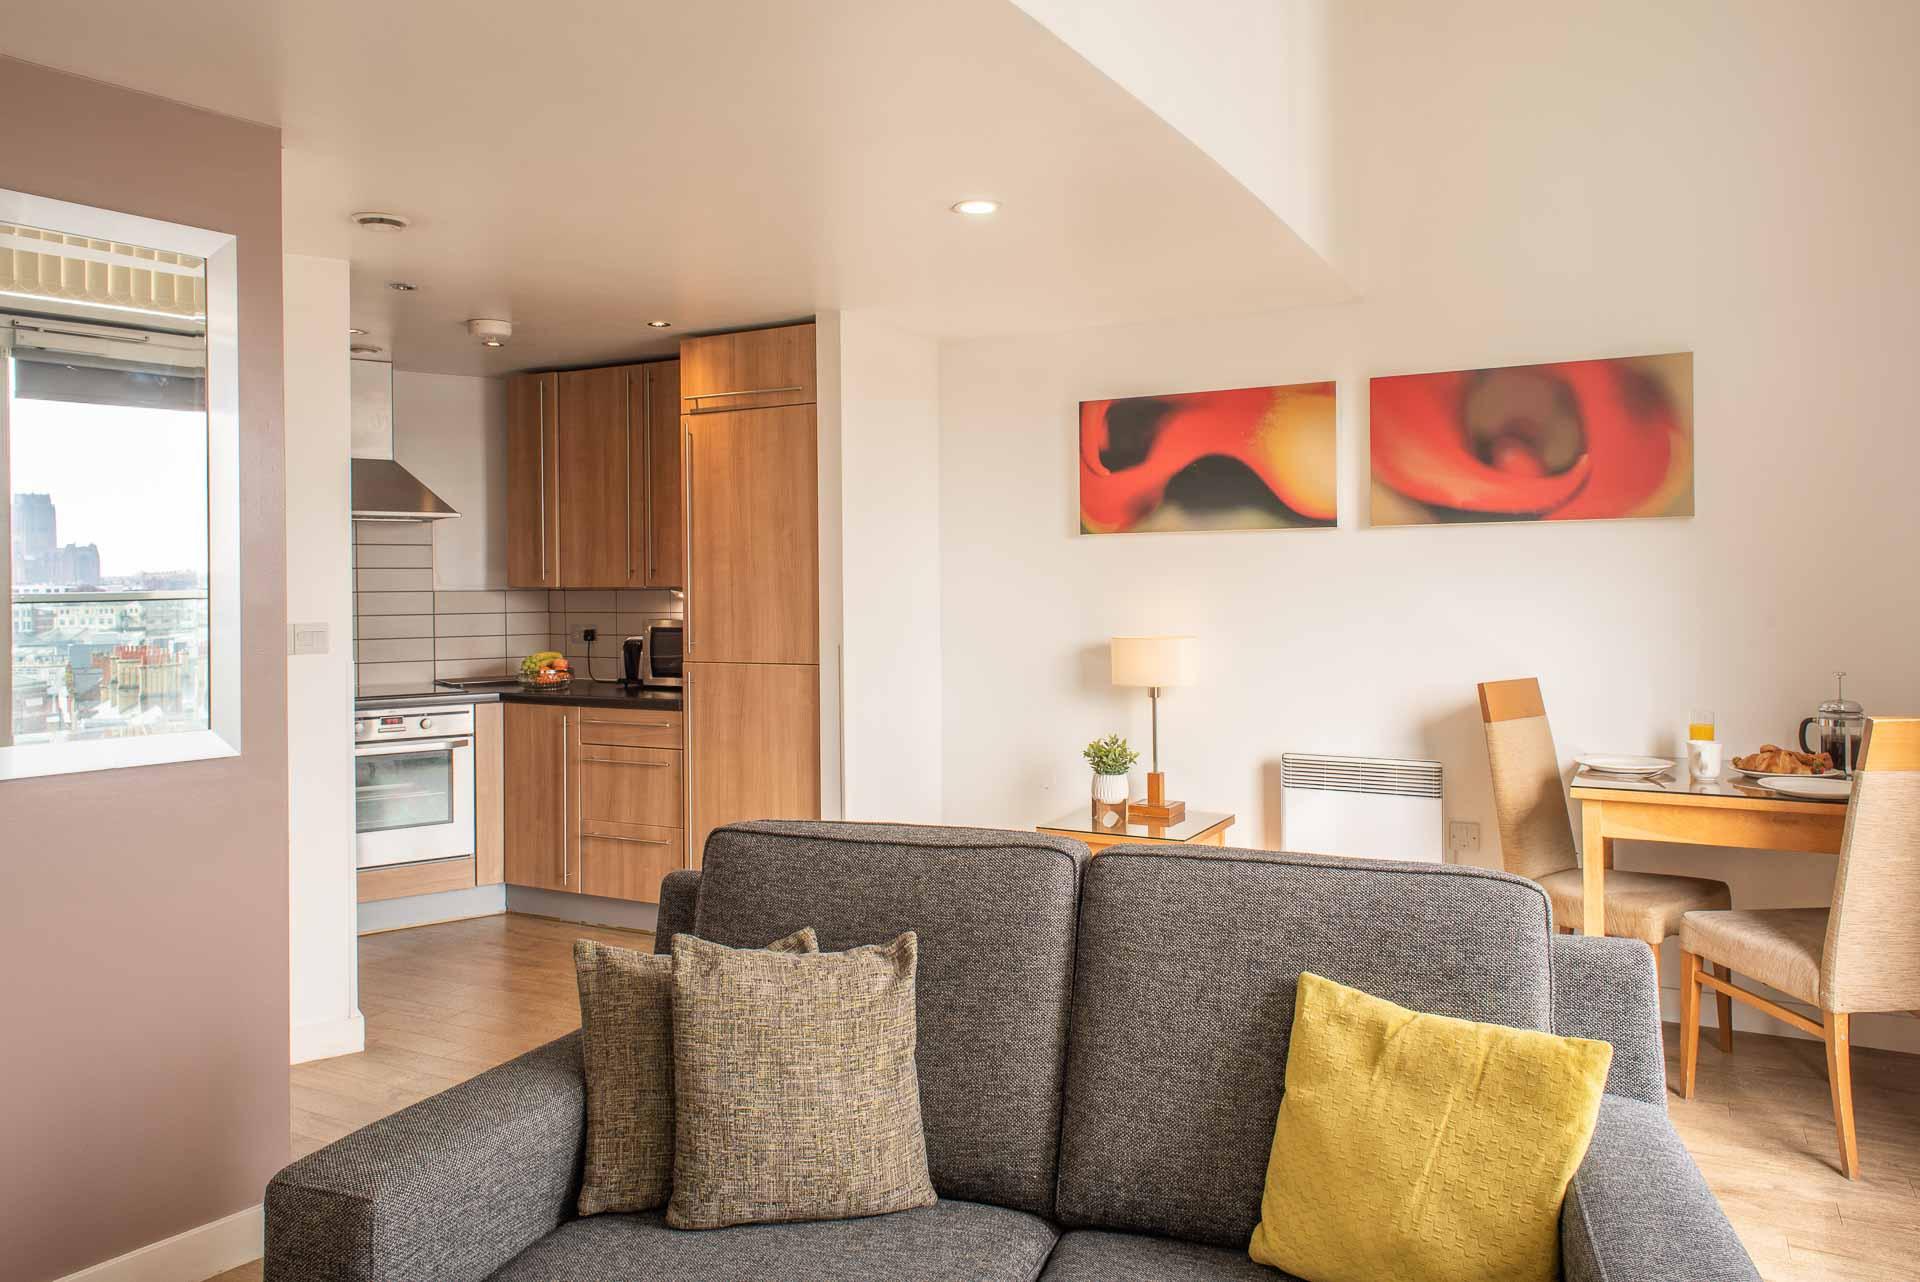 Kitchen/living area at Premier Suites Liverpool, Centre, Liverpool - Citybase Apartments